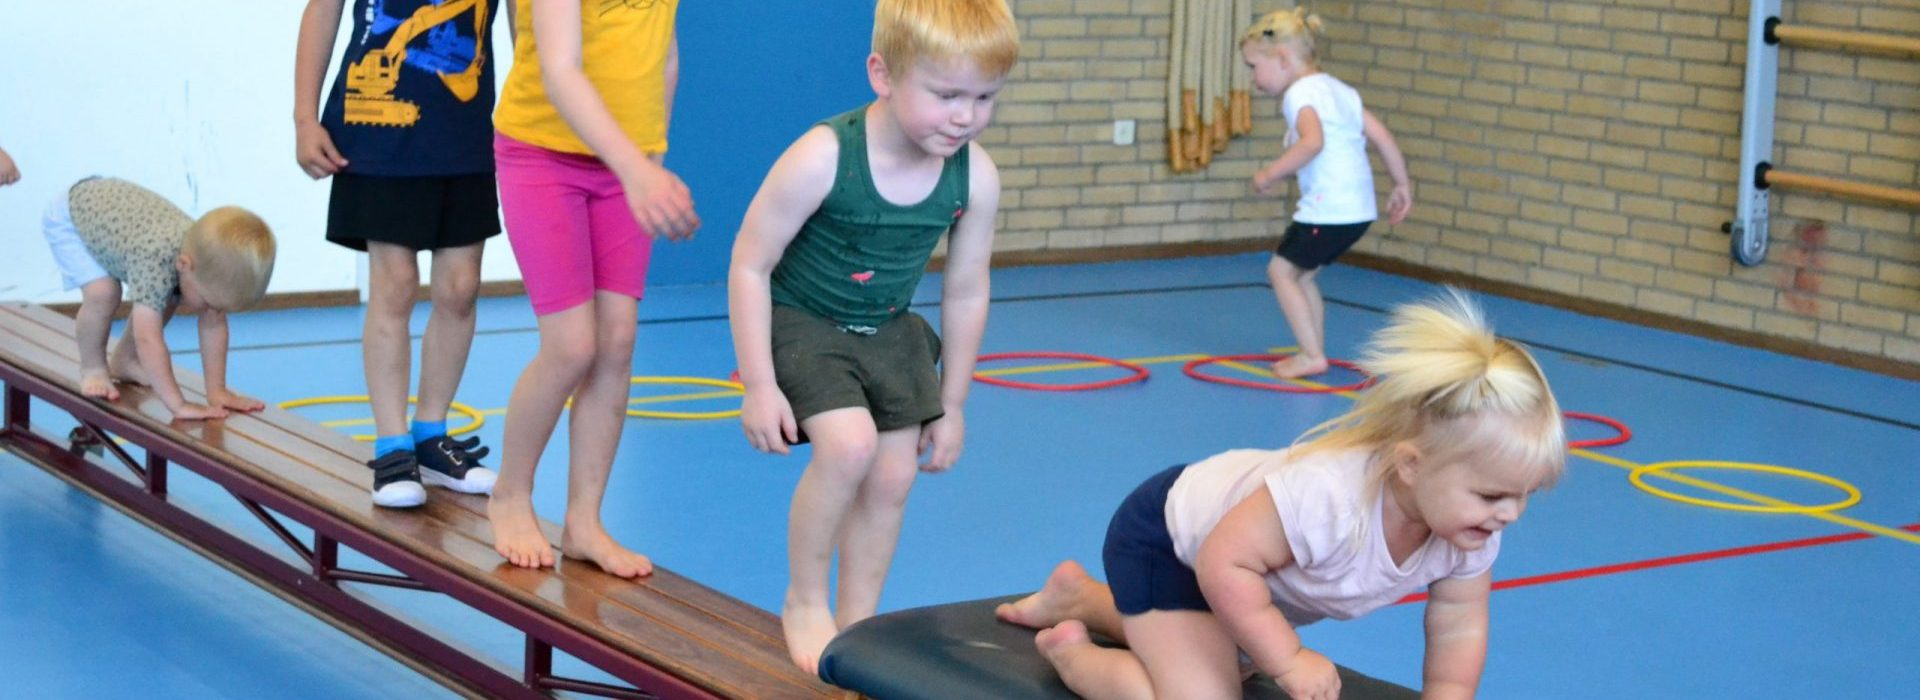 Gymnastiekvereniging Stanfries